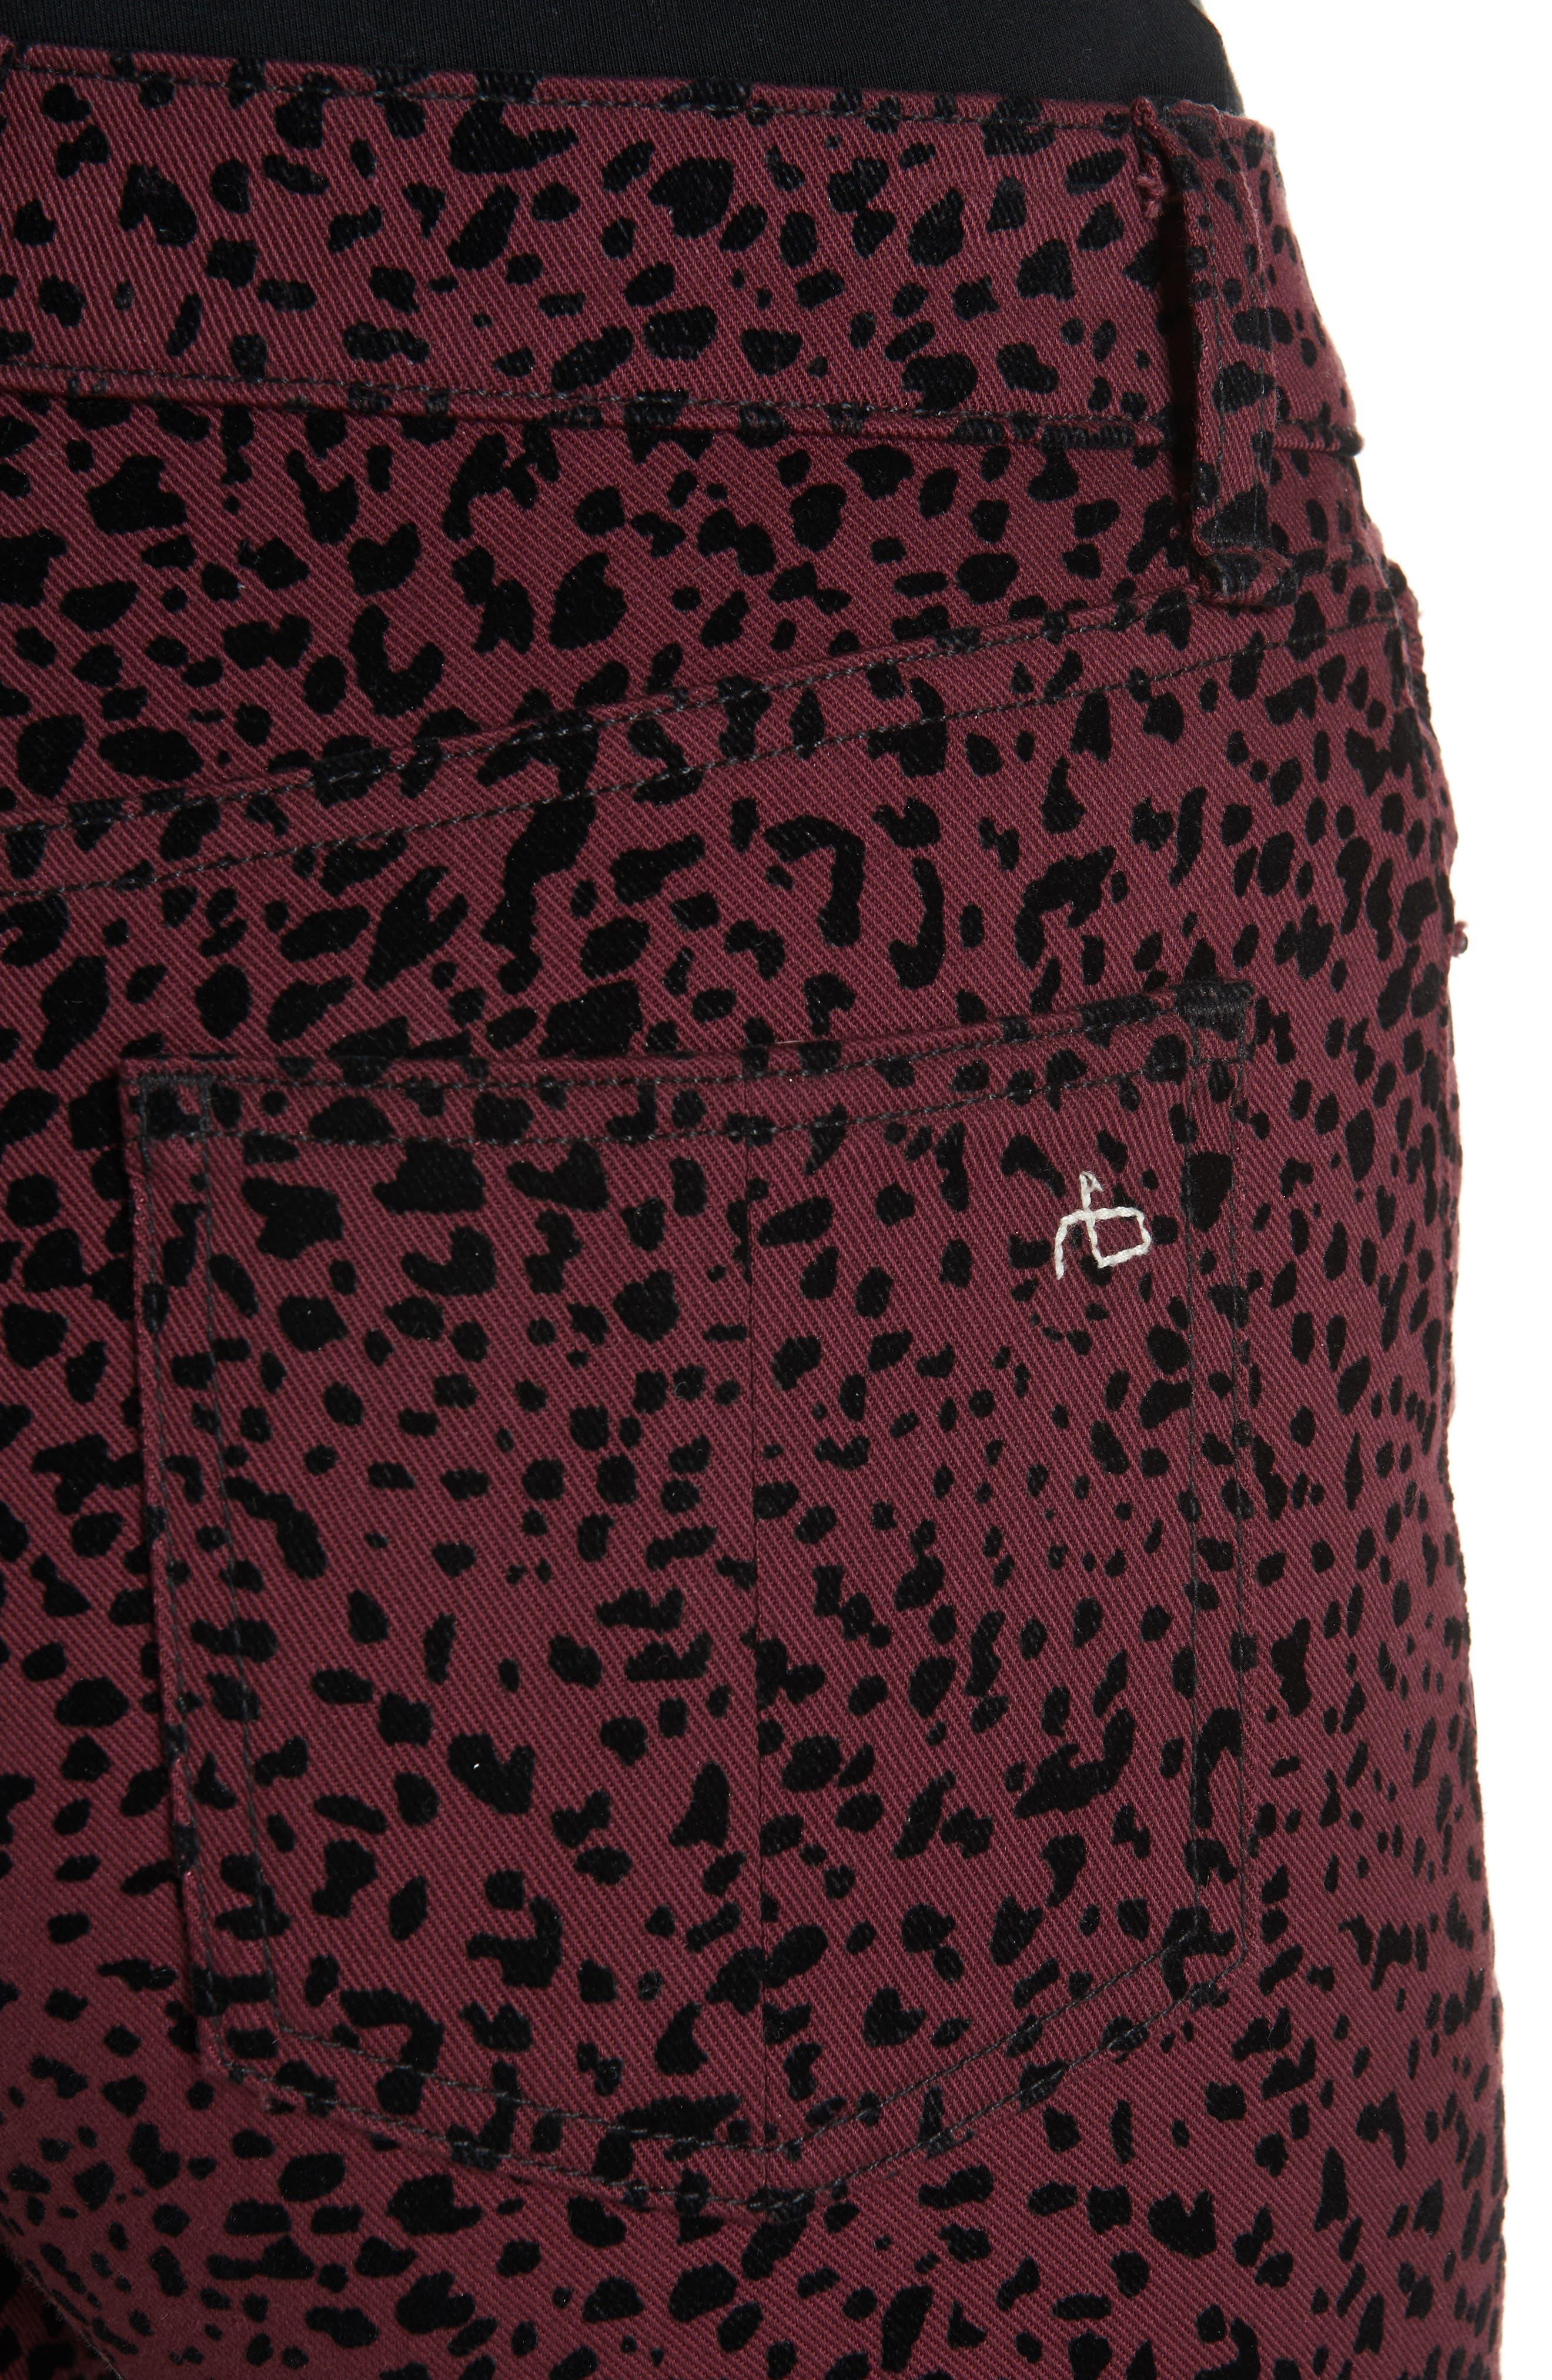 Hana High Waist Crop Flare Jeans,                             Alternate thumbnail 4, color,                             930